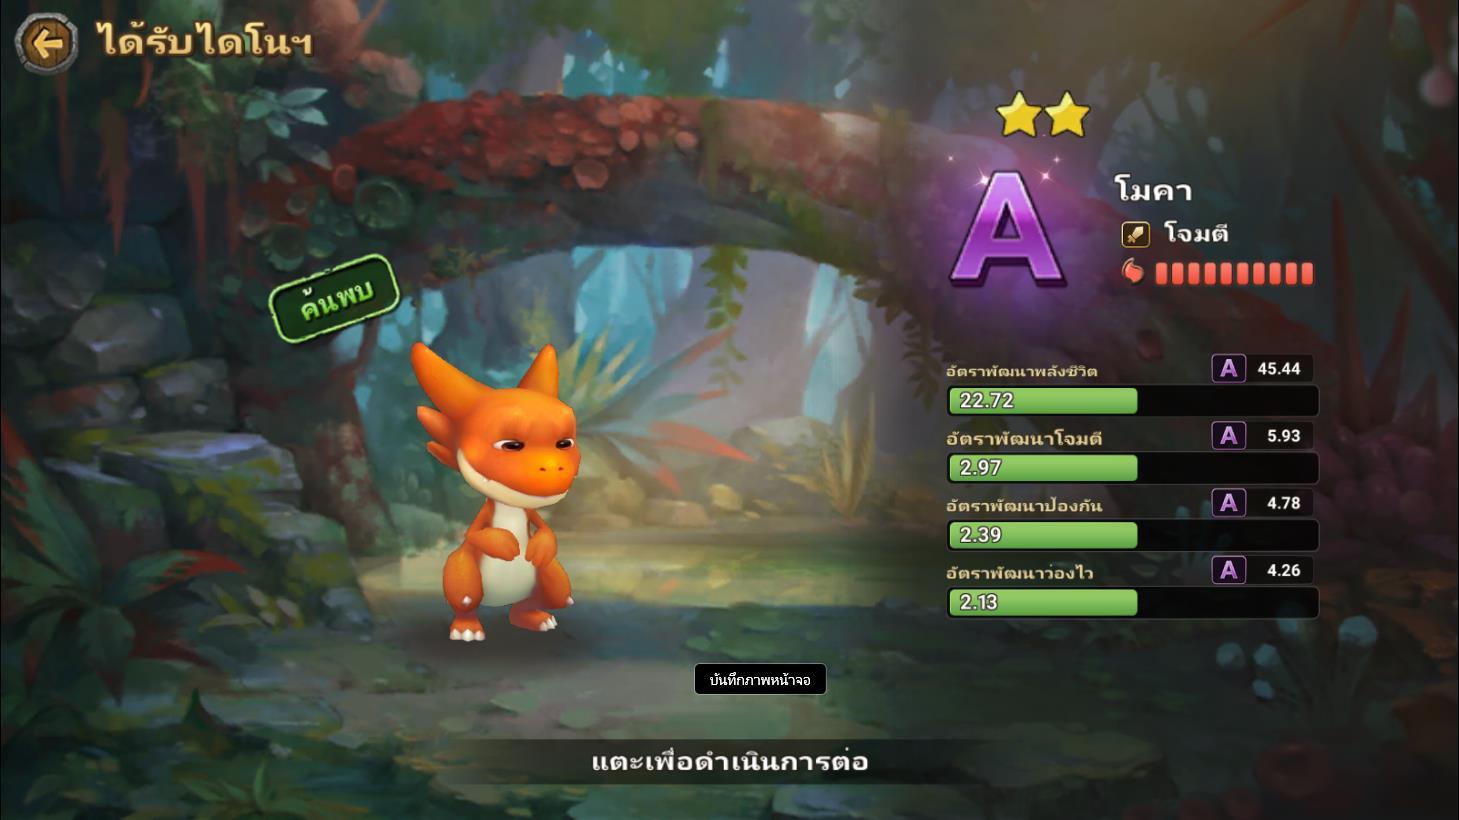 StoneAge World Screenshot 2020.06.24 18.03.26